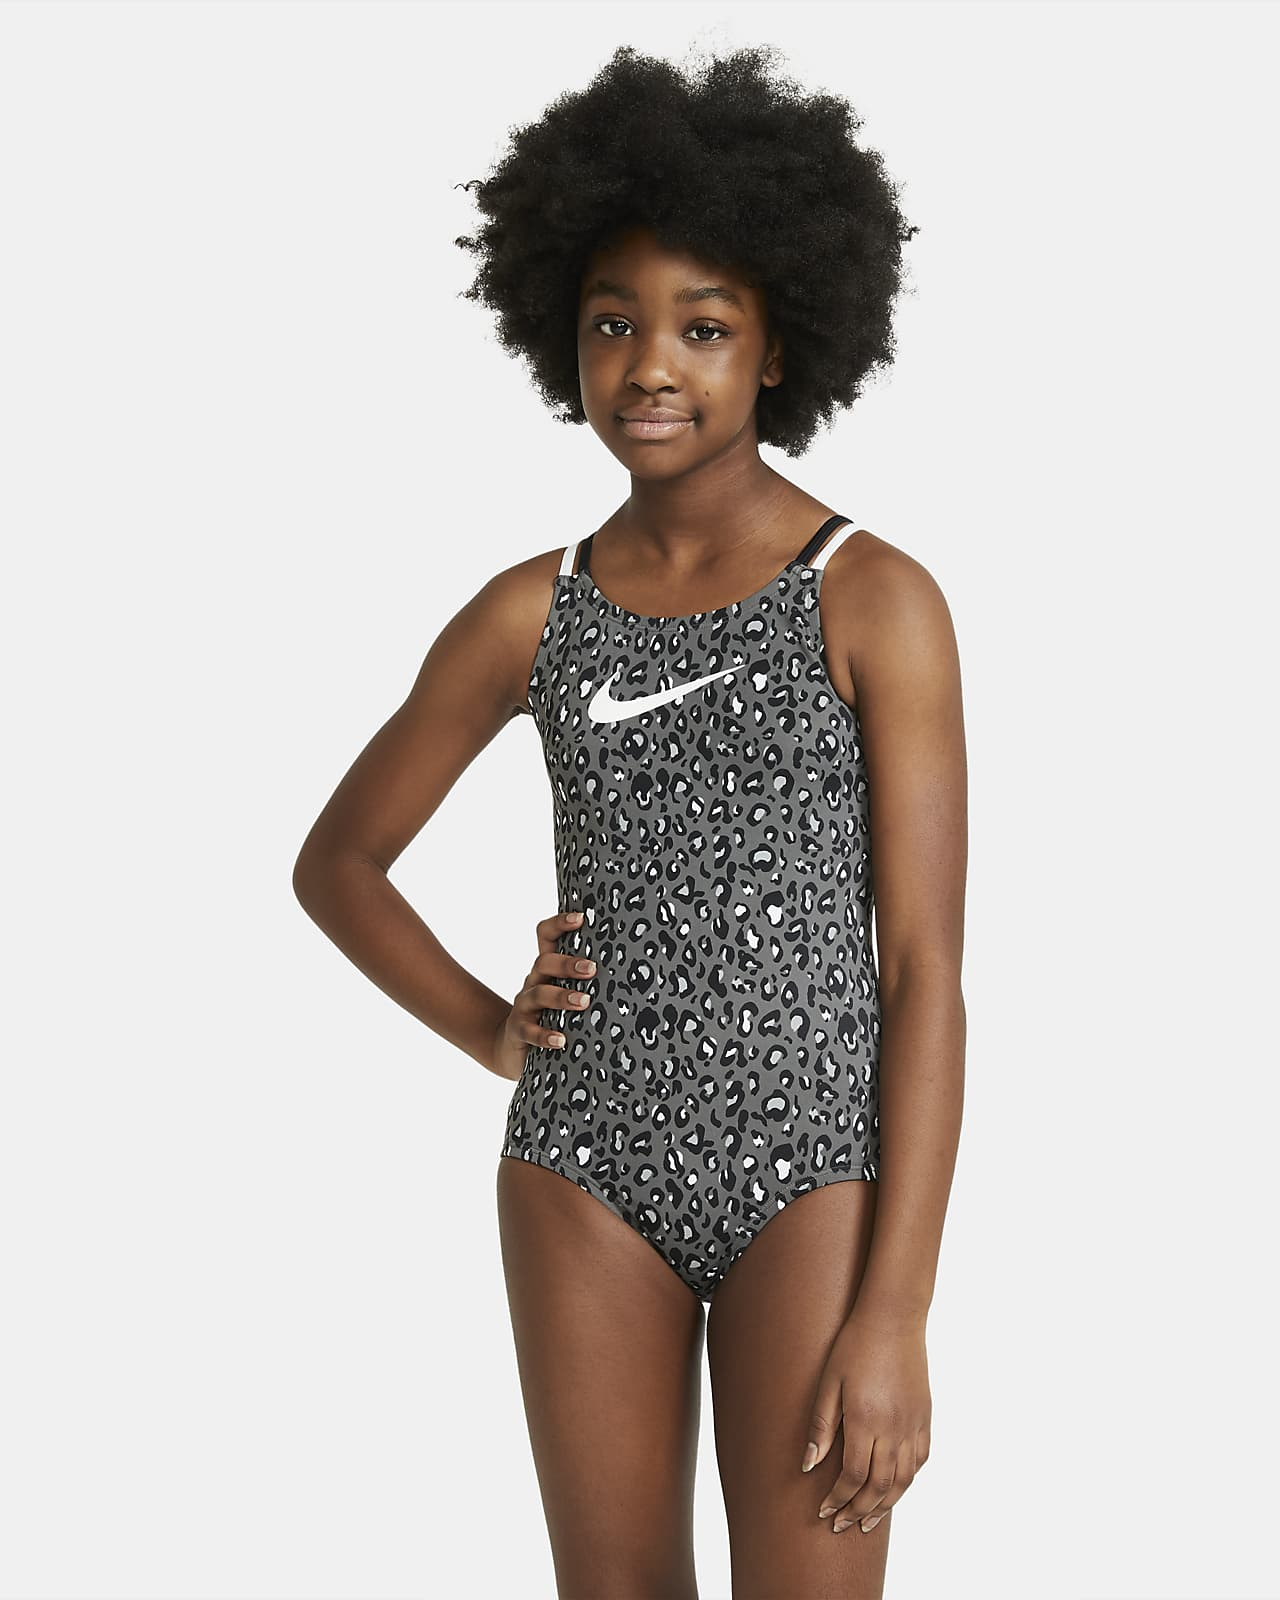 Nike Older Kids' (Girls') Spiderback 1-Piece Swimsuit